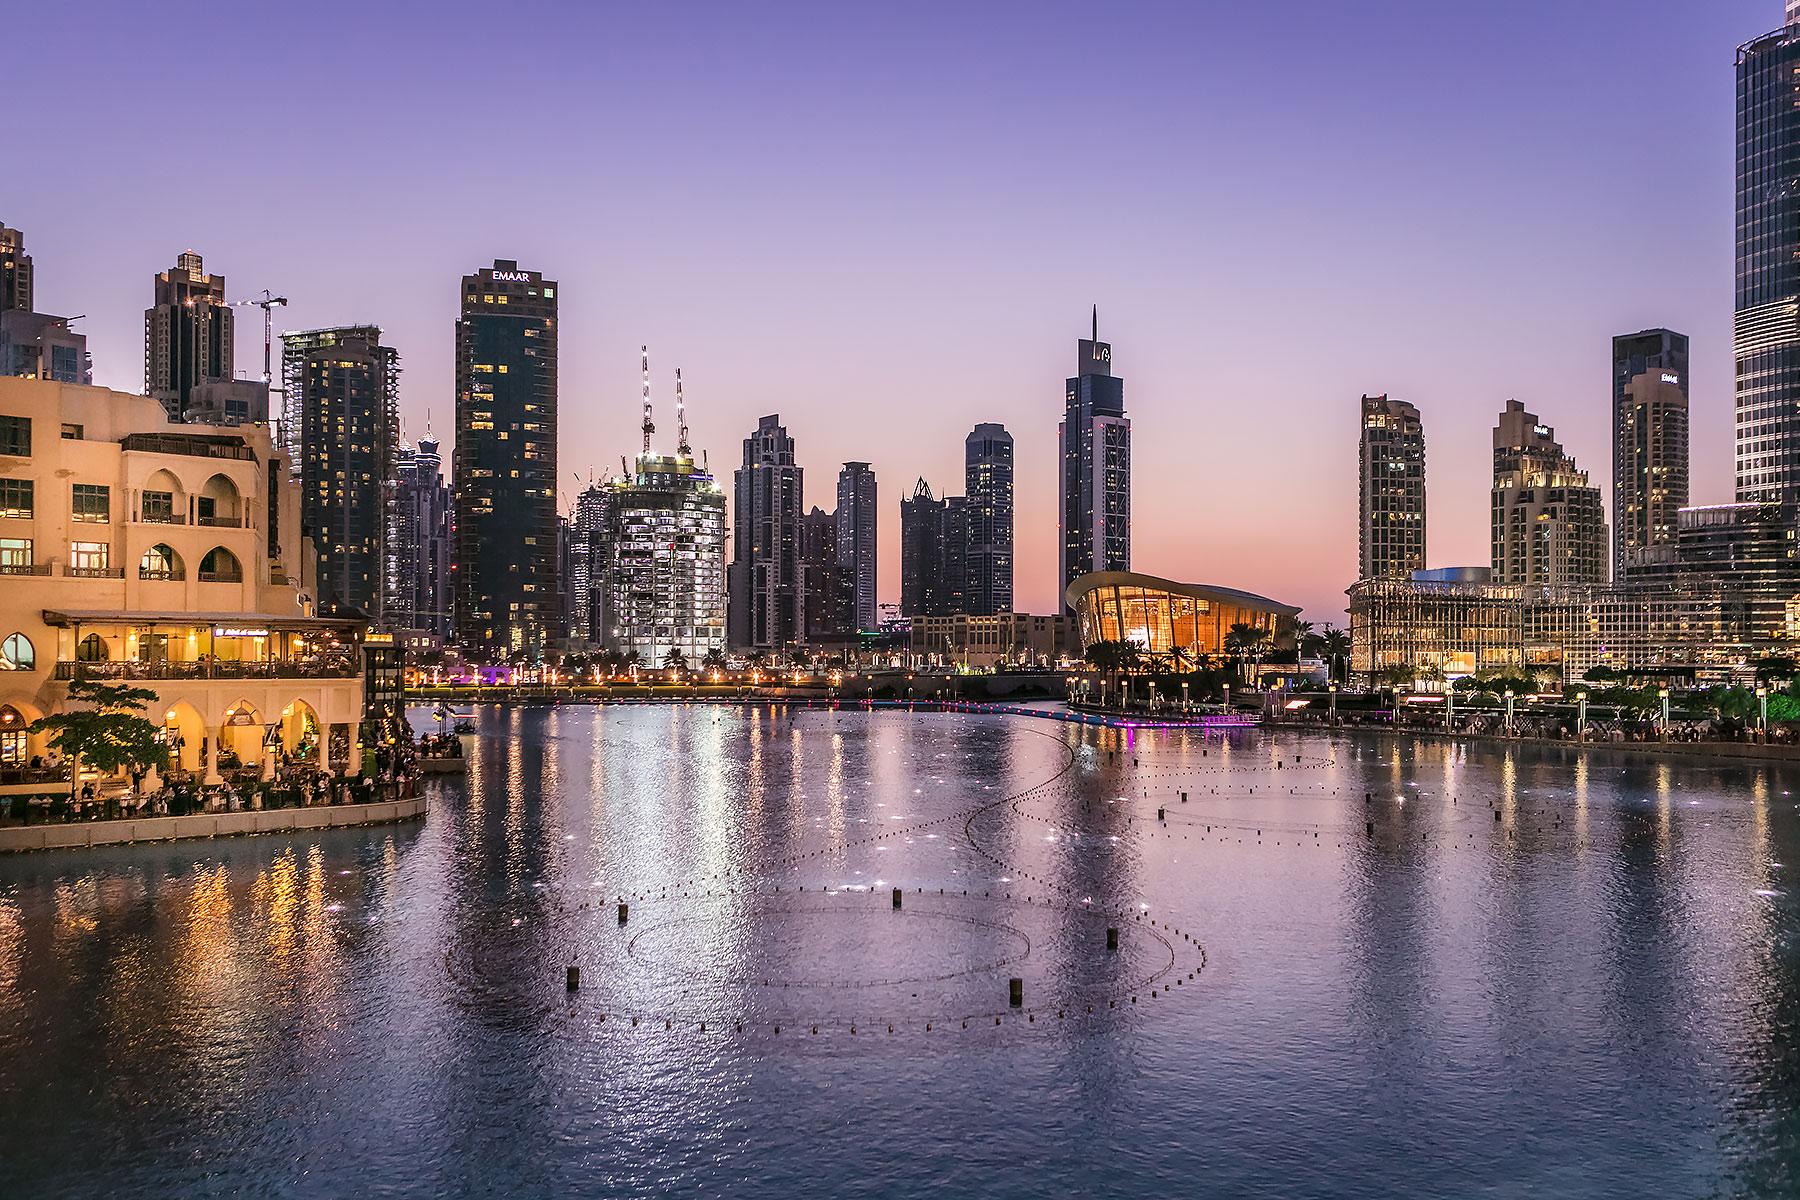 Dubai-9356-Edit.jpg